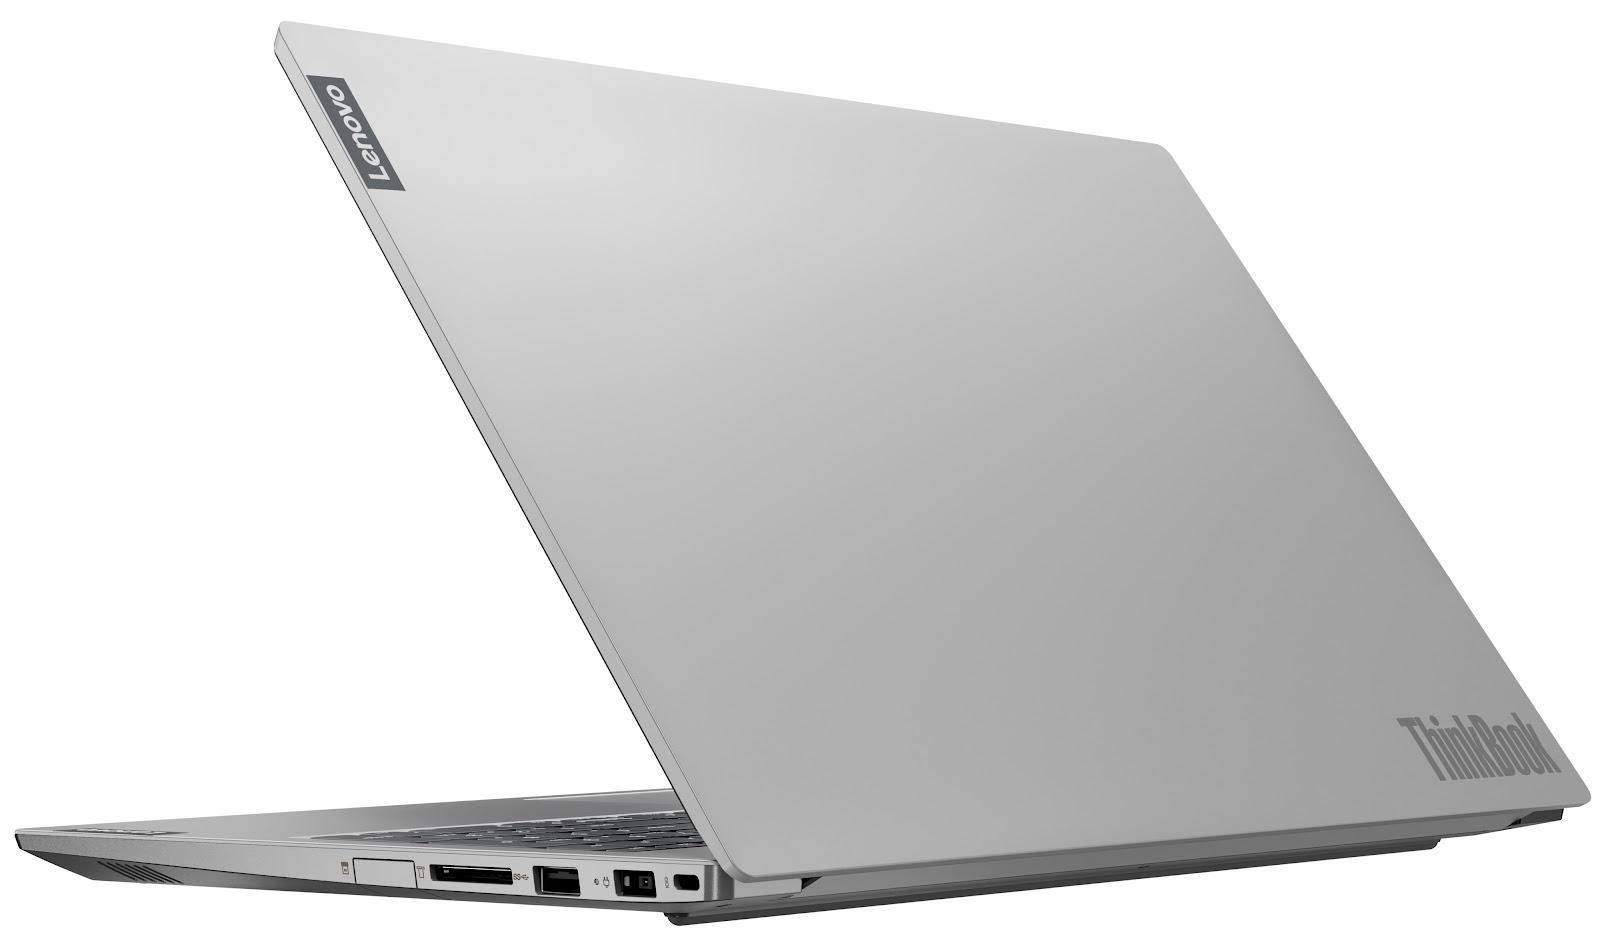 Фото 1. Ноутбук Lenovo ThinkBook 15-IIL (20SM0027RU)